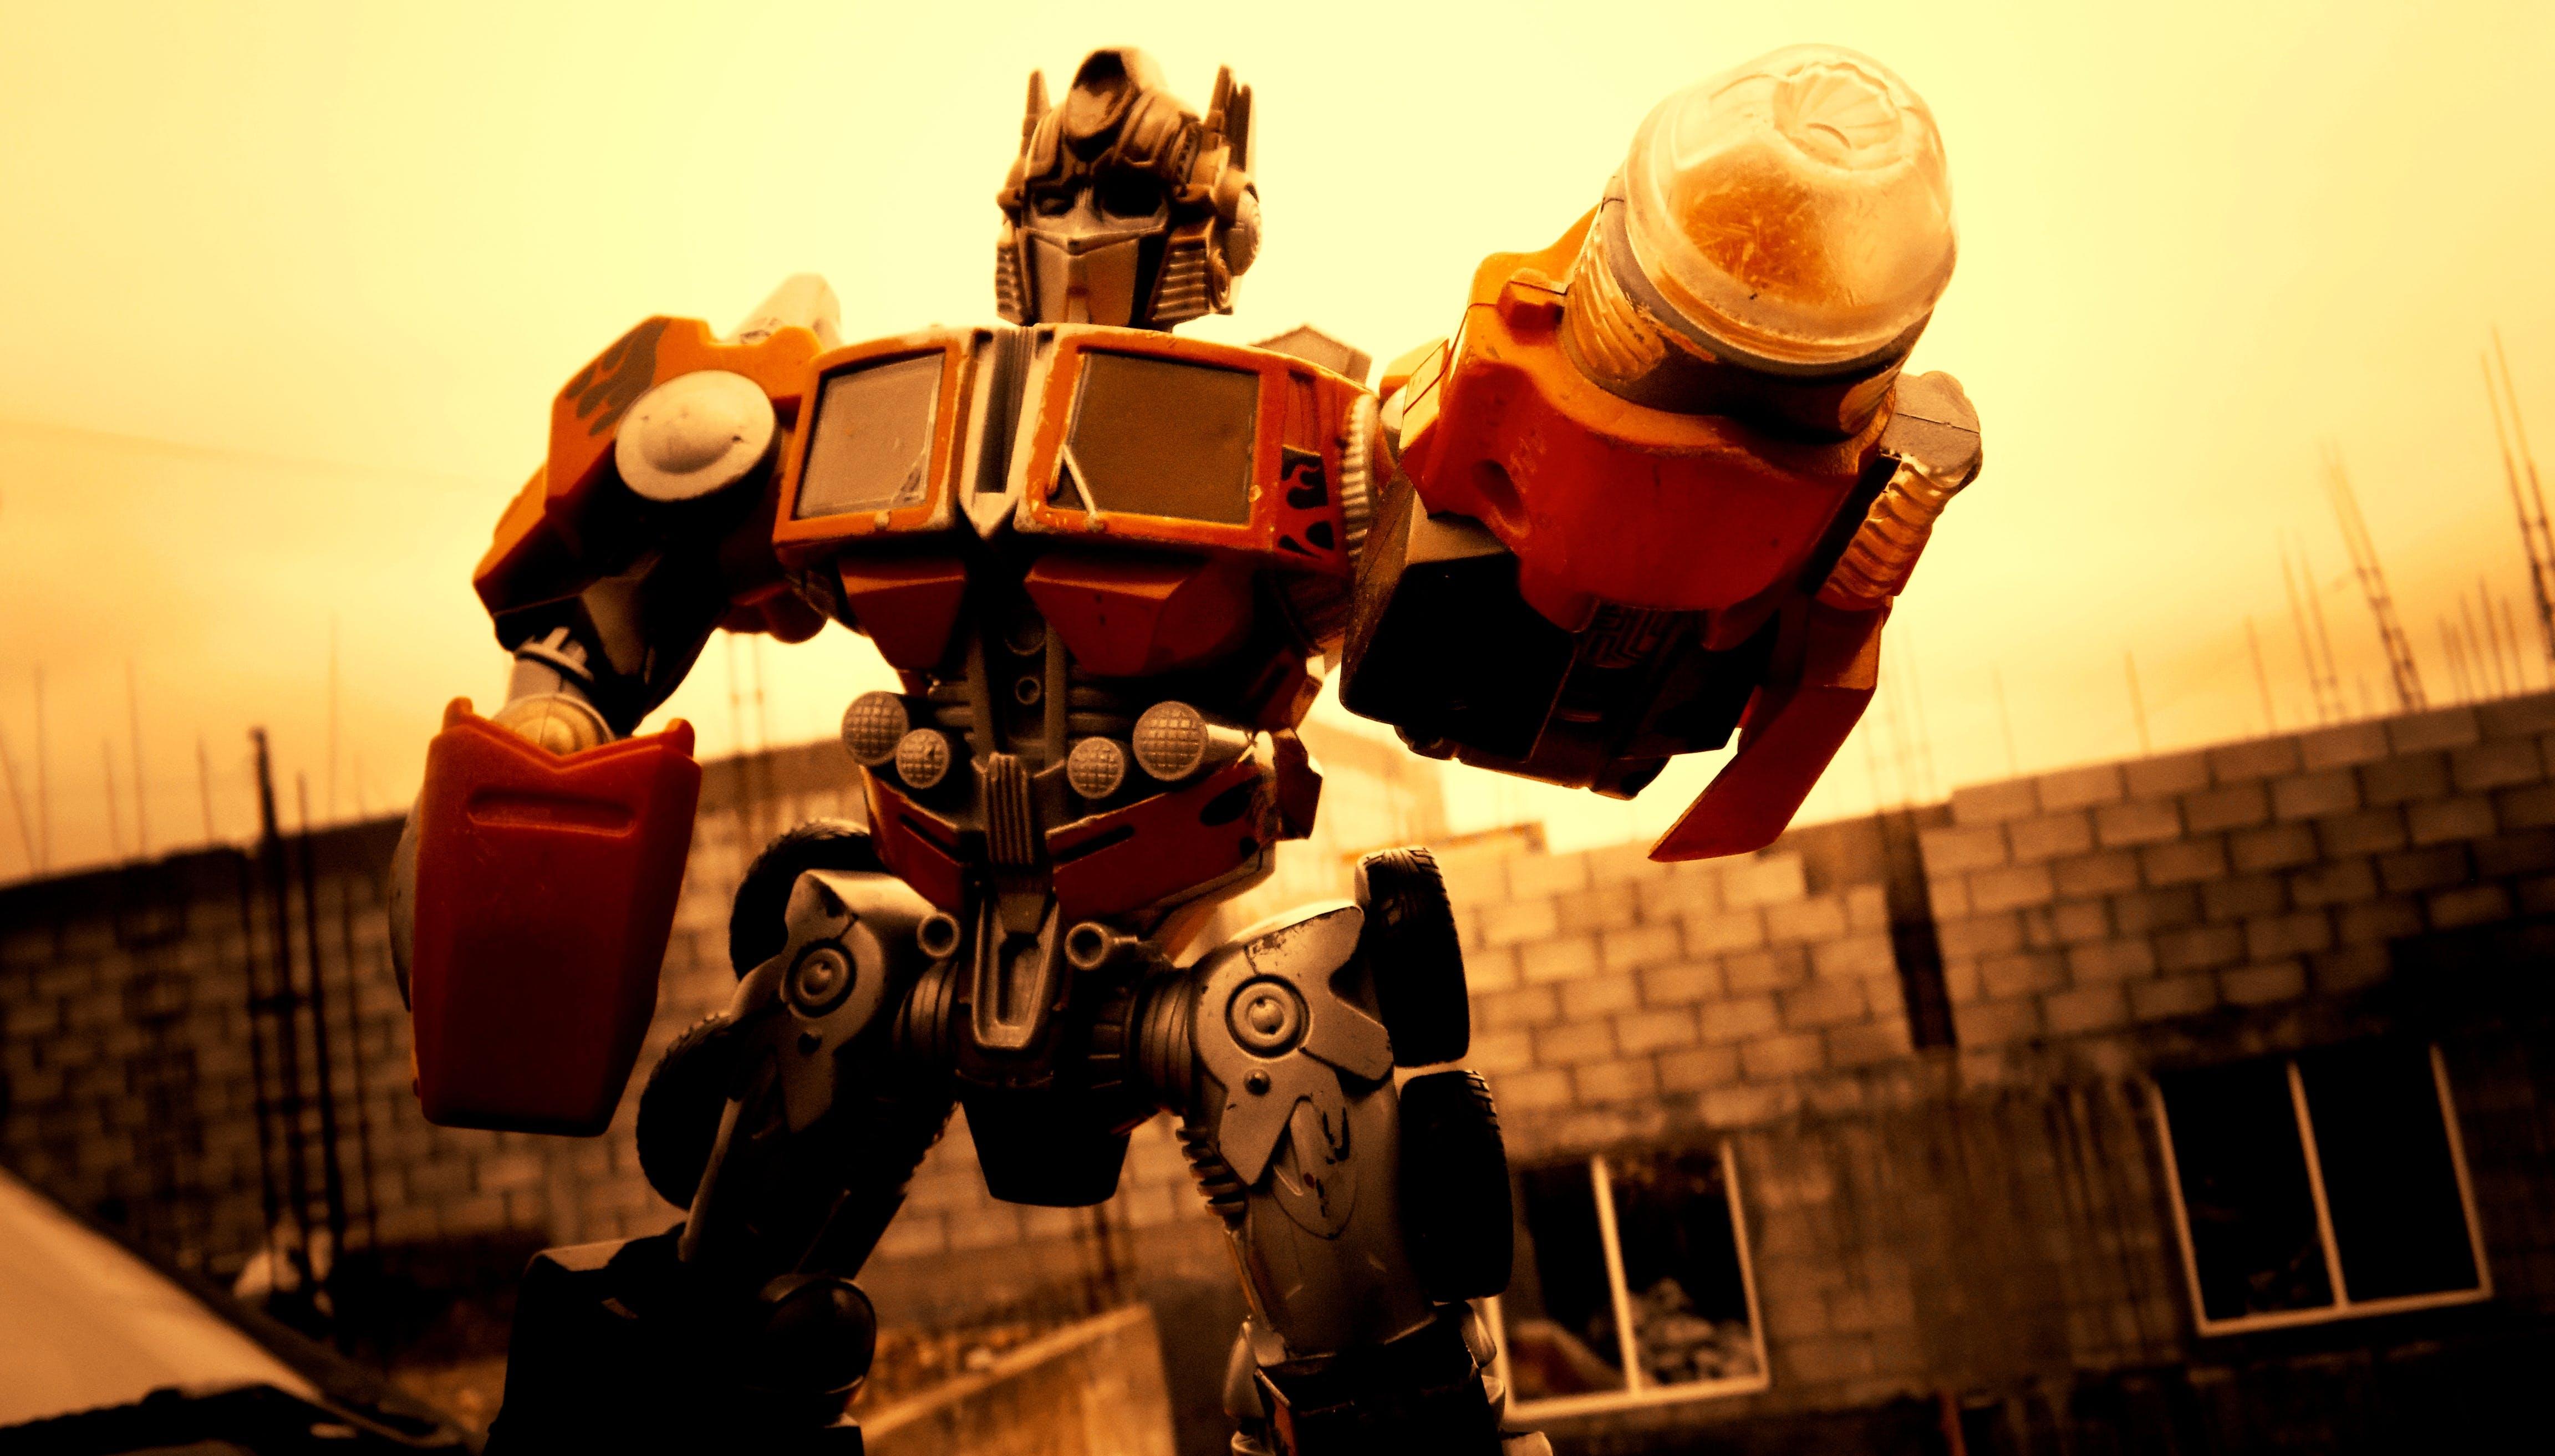 Free stock photo of fotografia, optimus prime, transformers